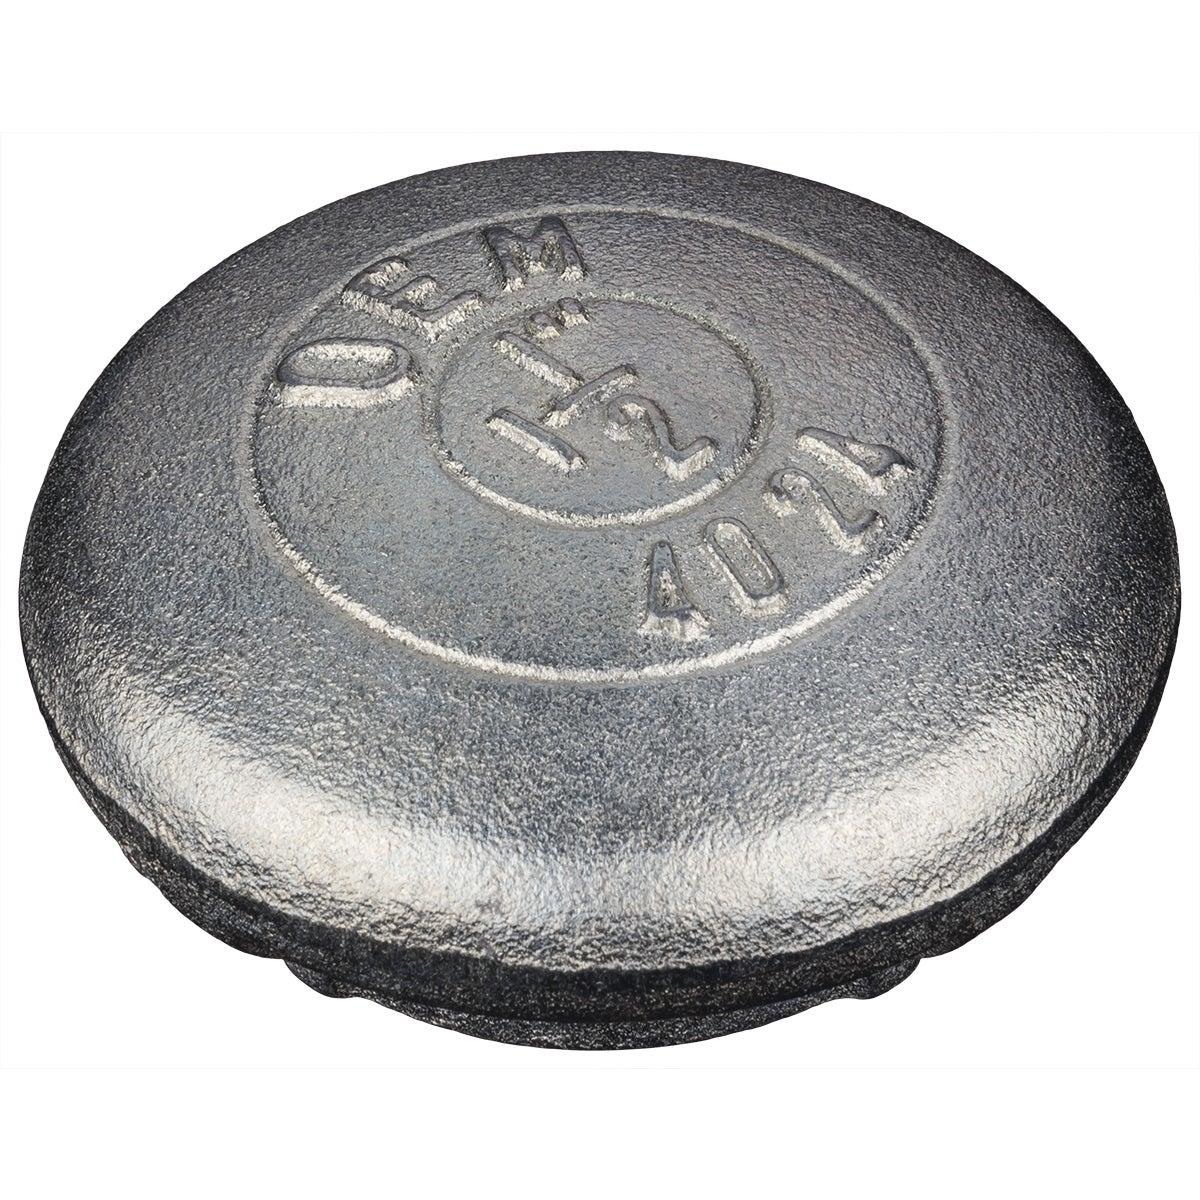 1-1/2 MSHRM TNK VENT CAP - DIB464152 by Rheem